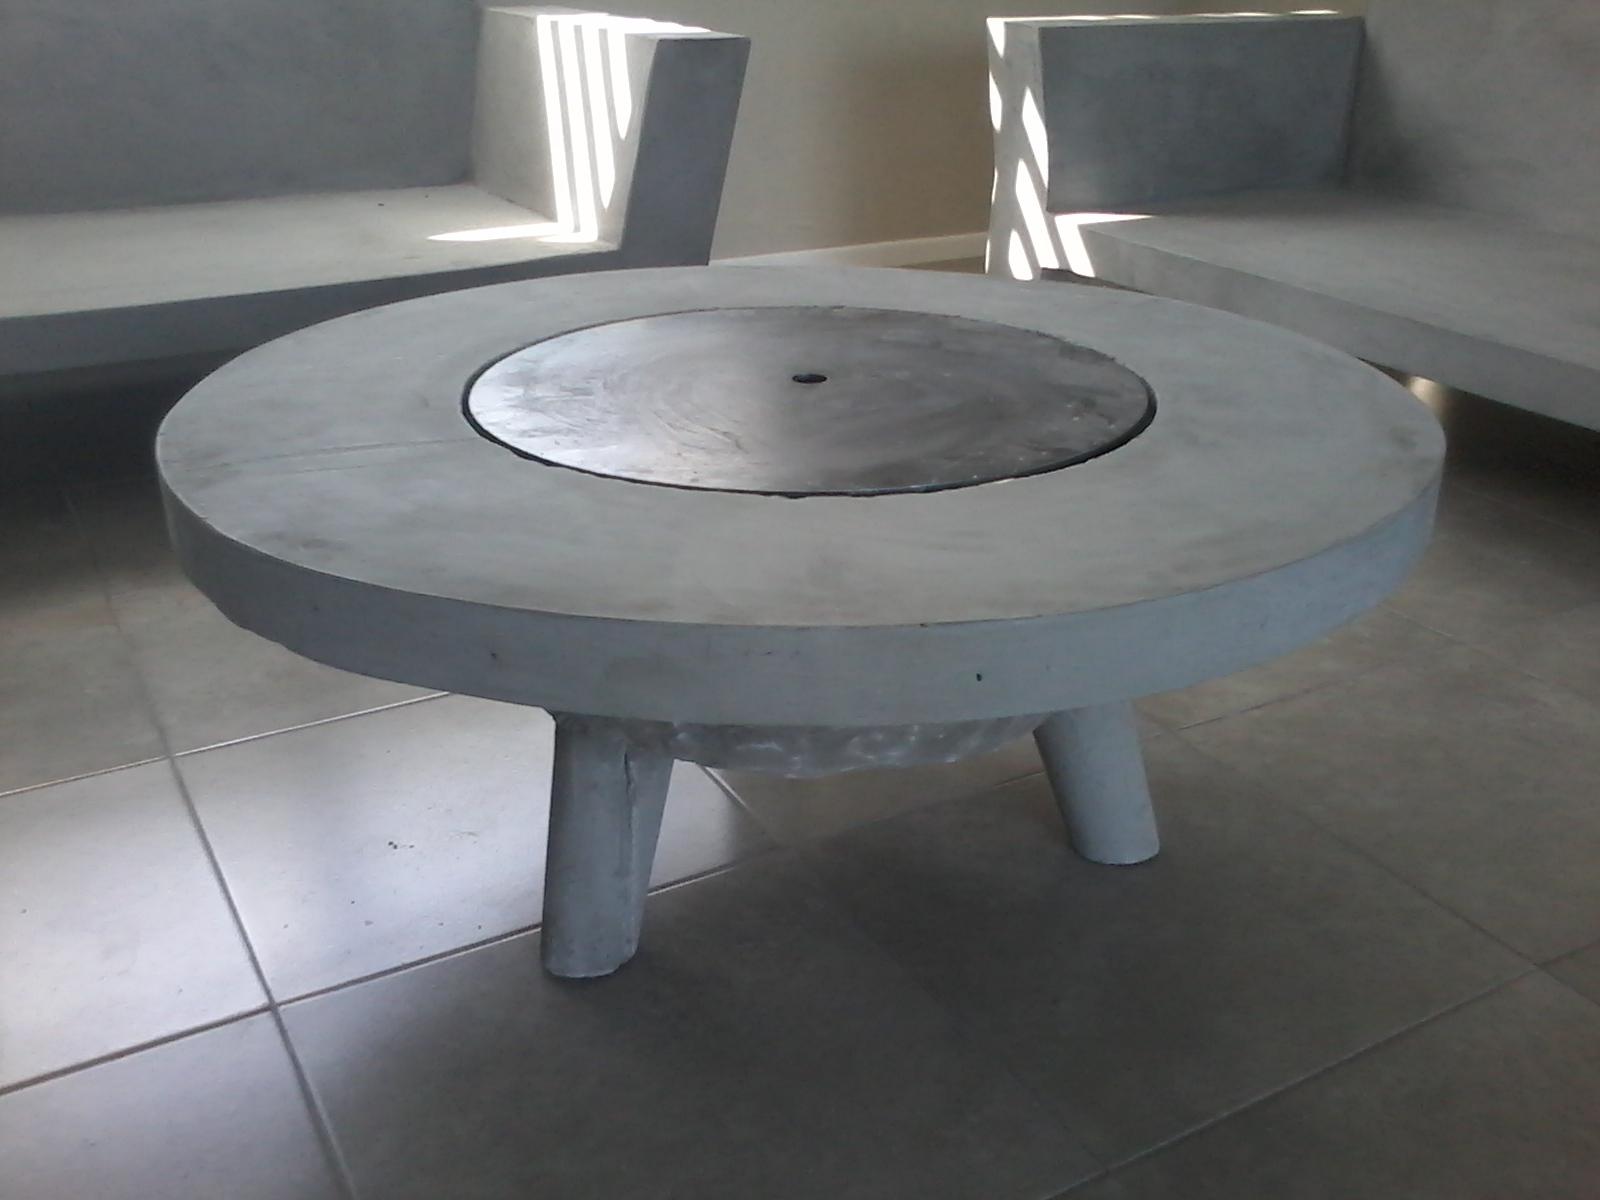 Muebles en cemento light estilo ribera mesa fogon redonda - Muebles con ladrillos ...